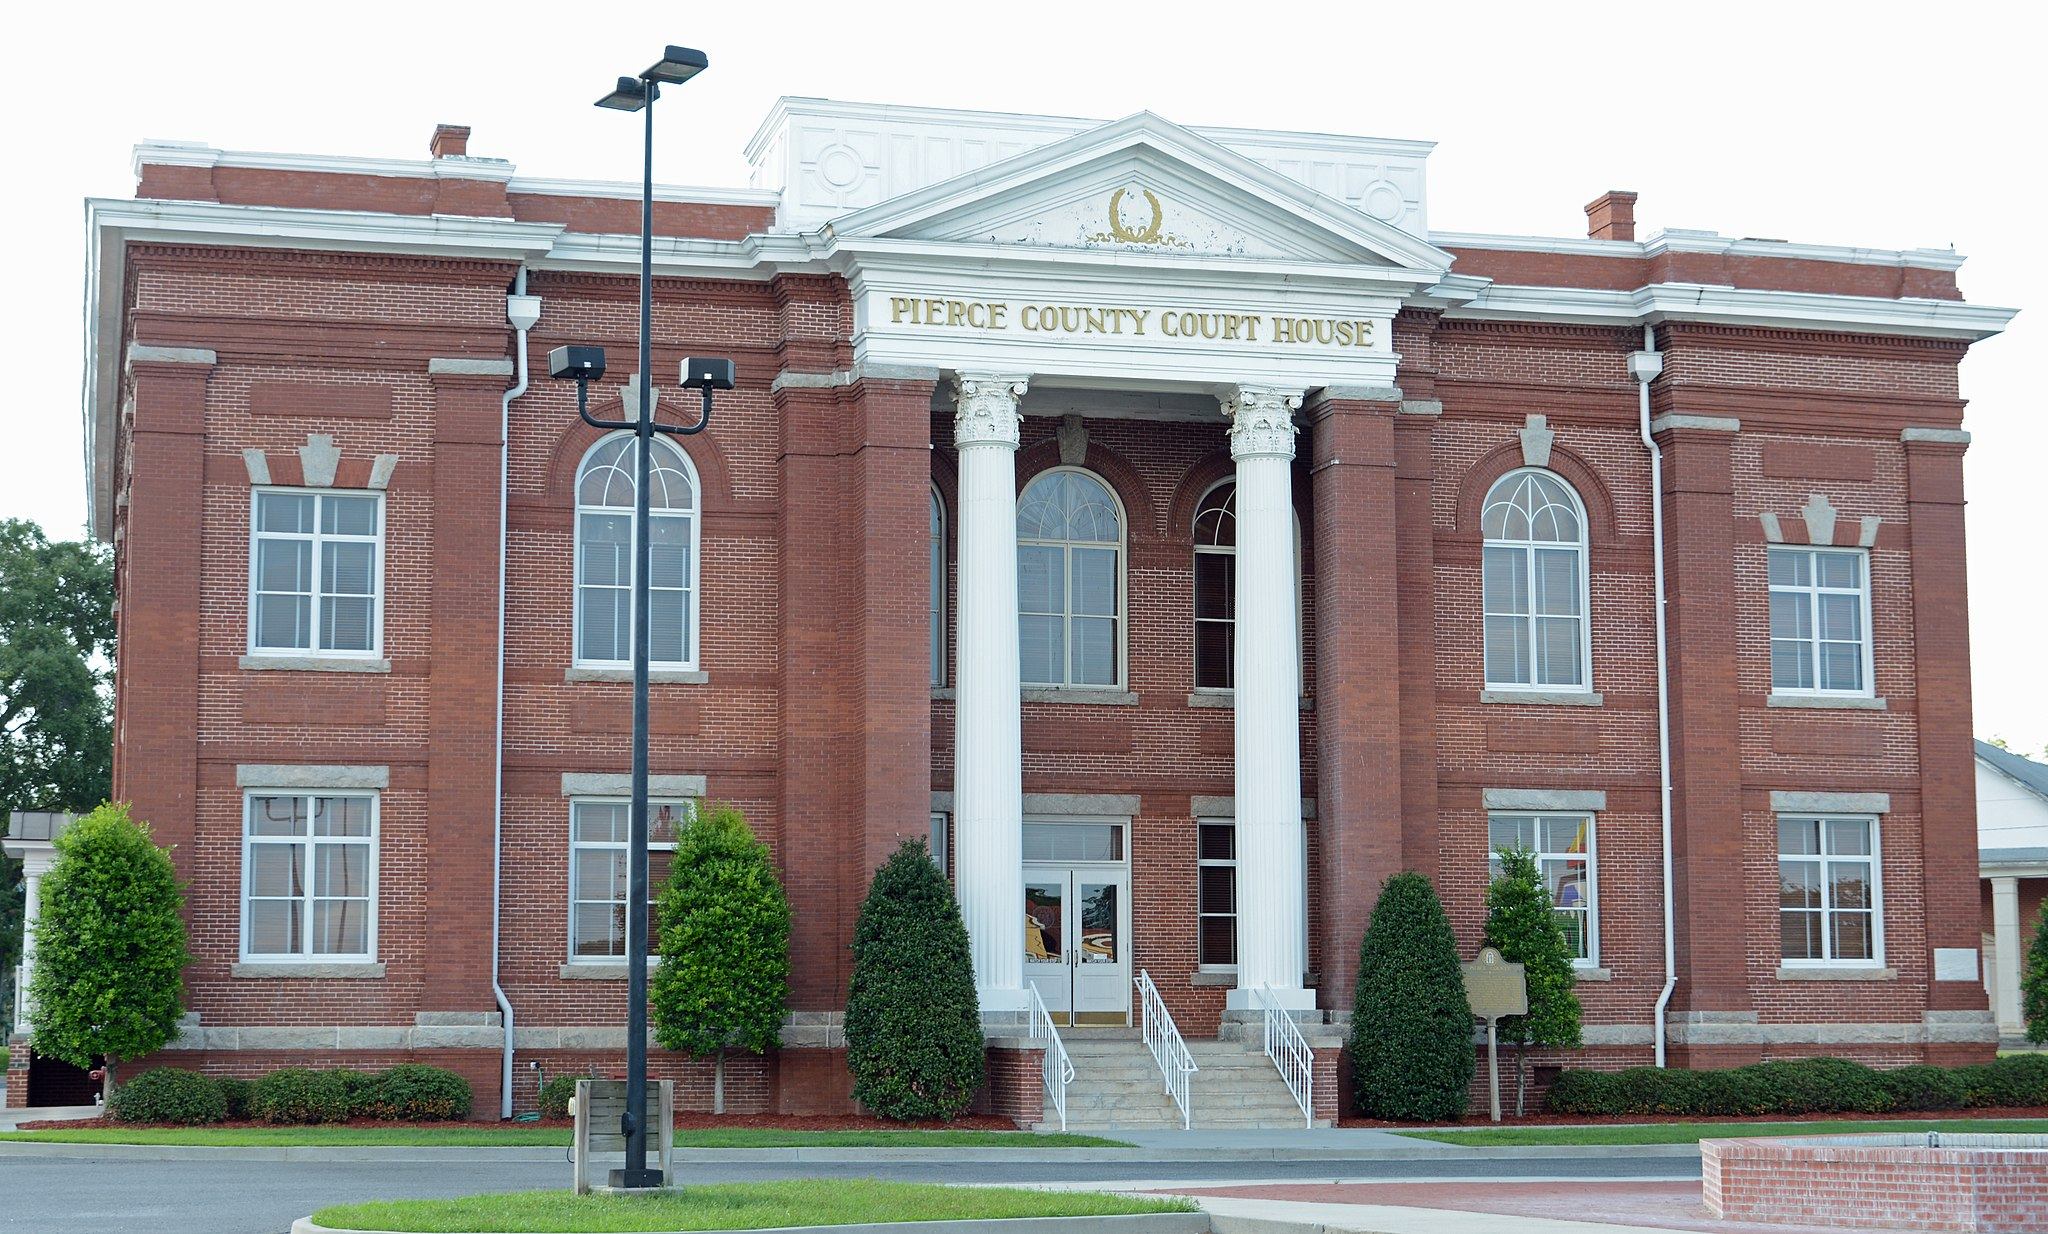 Pierce County Courthouse, Blackshear, GA, US